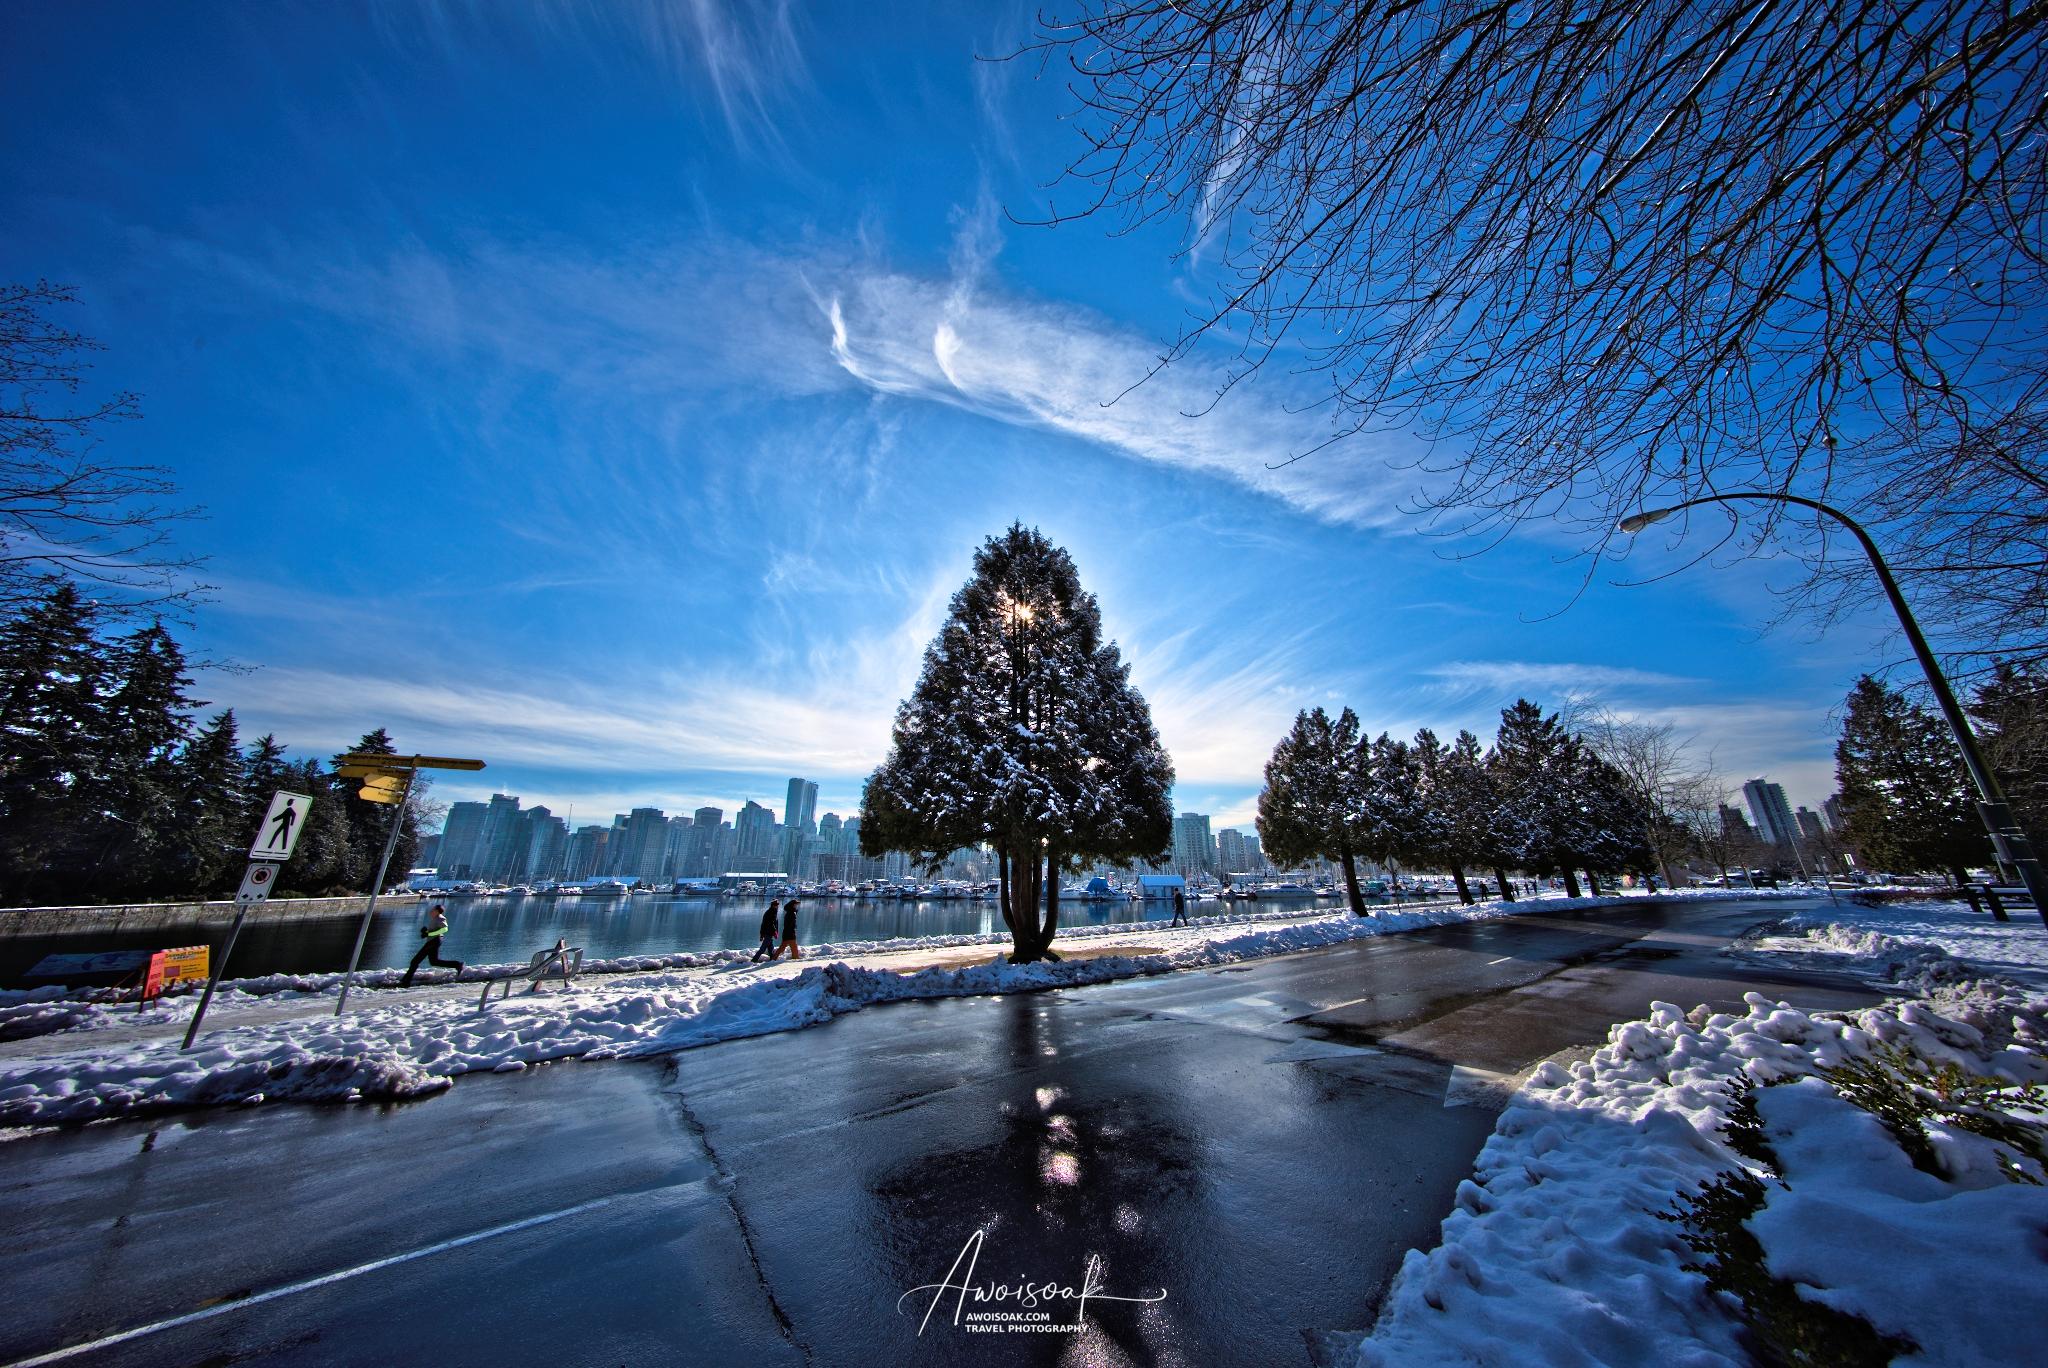 Stanley Park, Canada